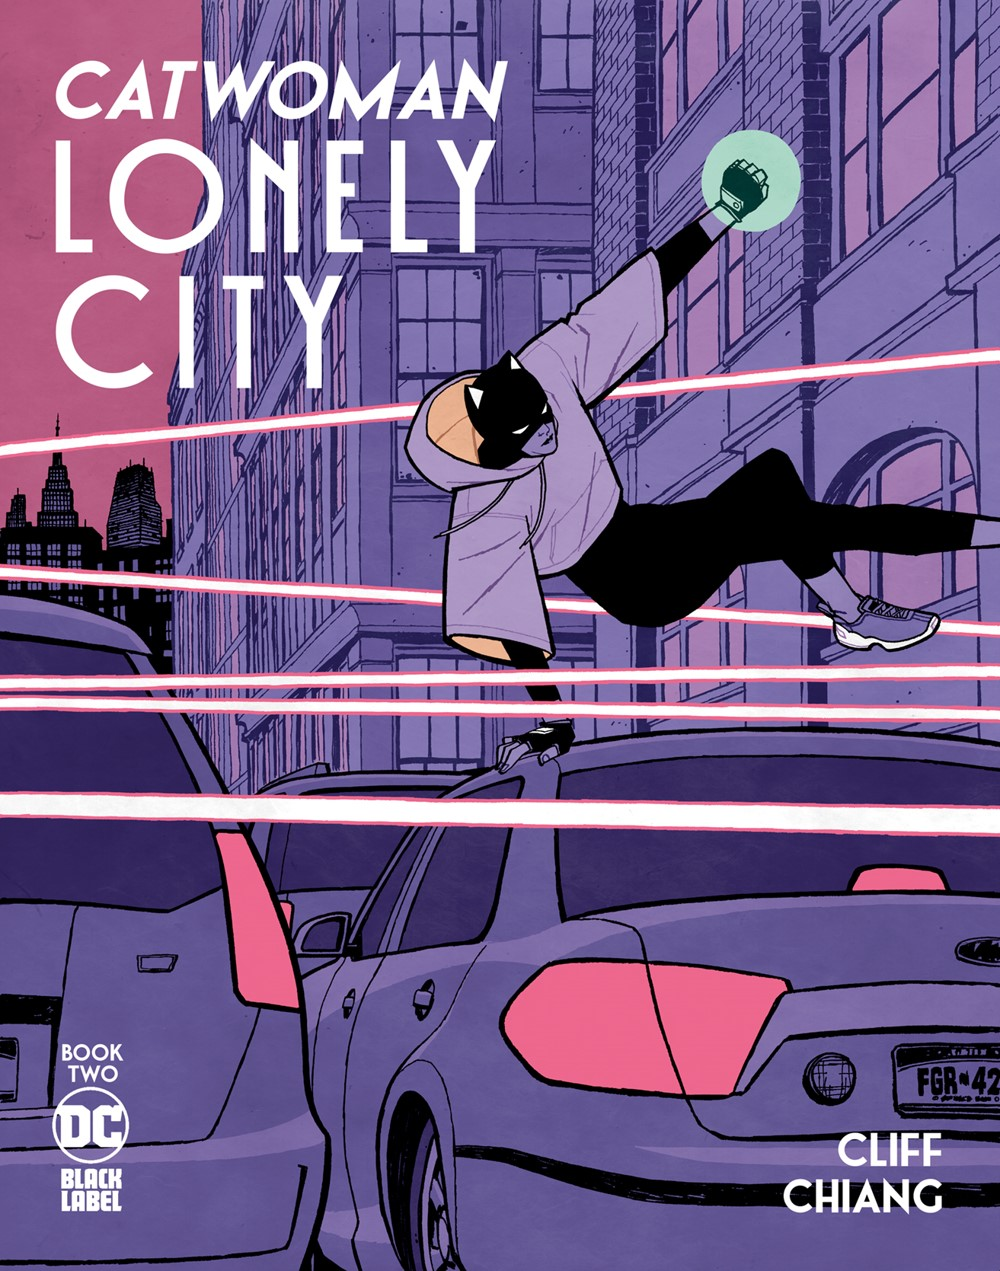 Catwoman_Lonely_City_Cv2-A DC Comics December 2021 Solicitations